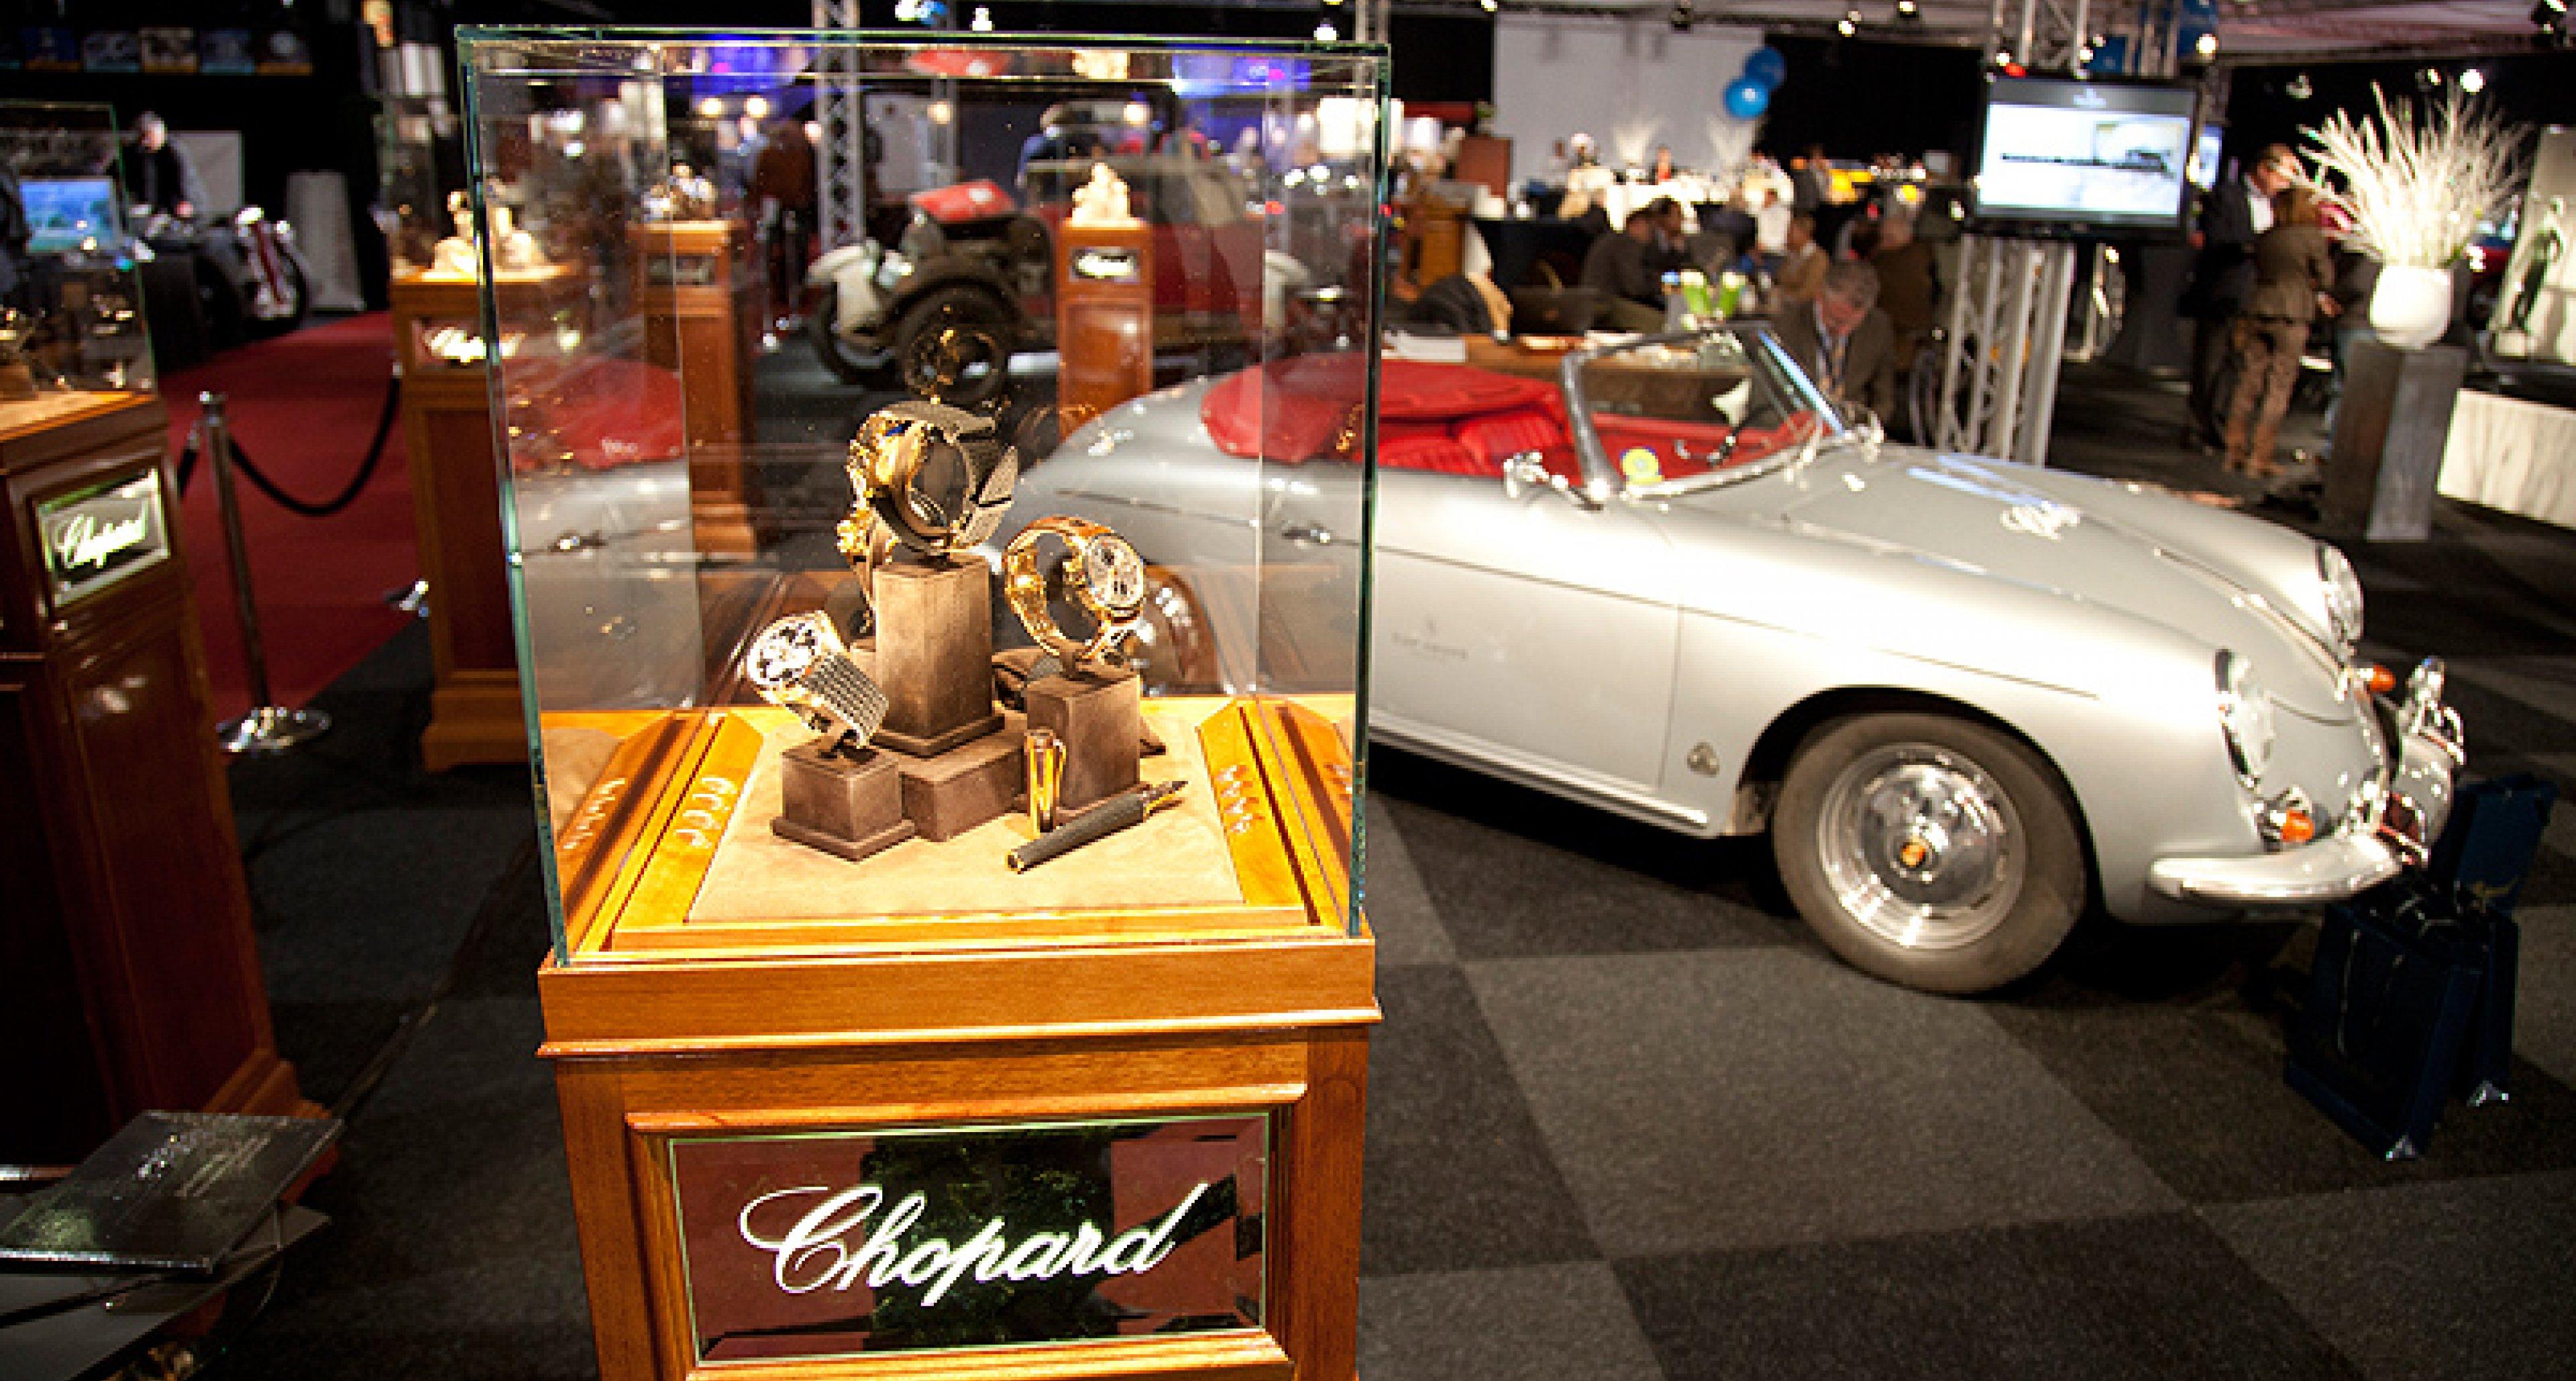 InterClassics & TopMobiel 2012 feiert Porsche und Mille Miglia